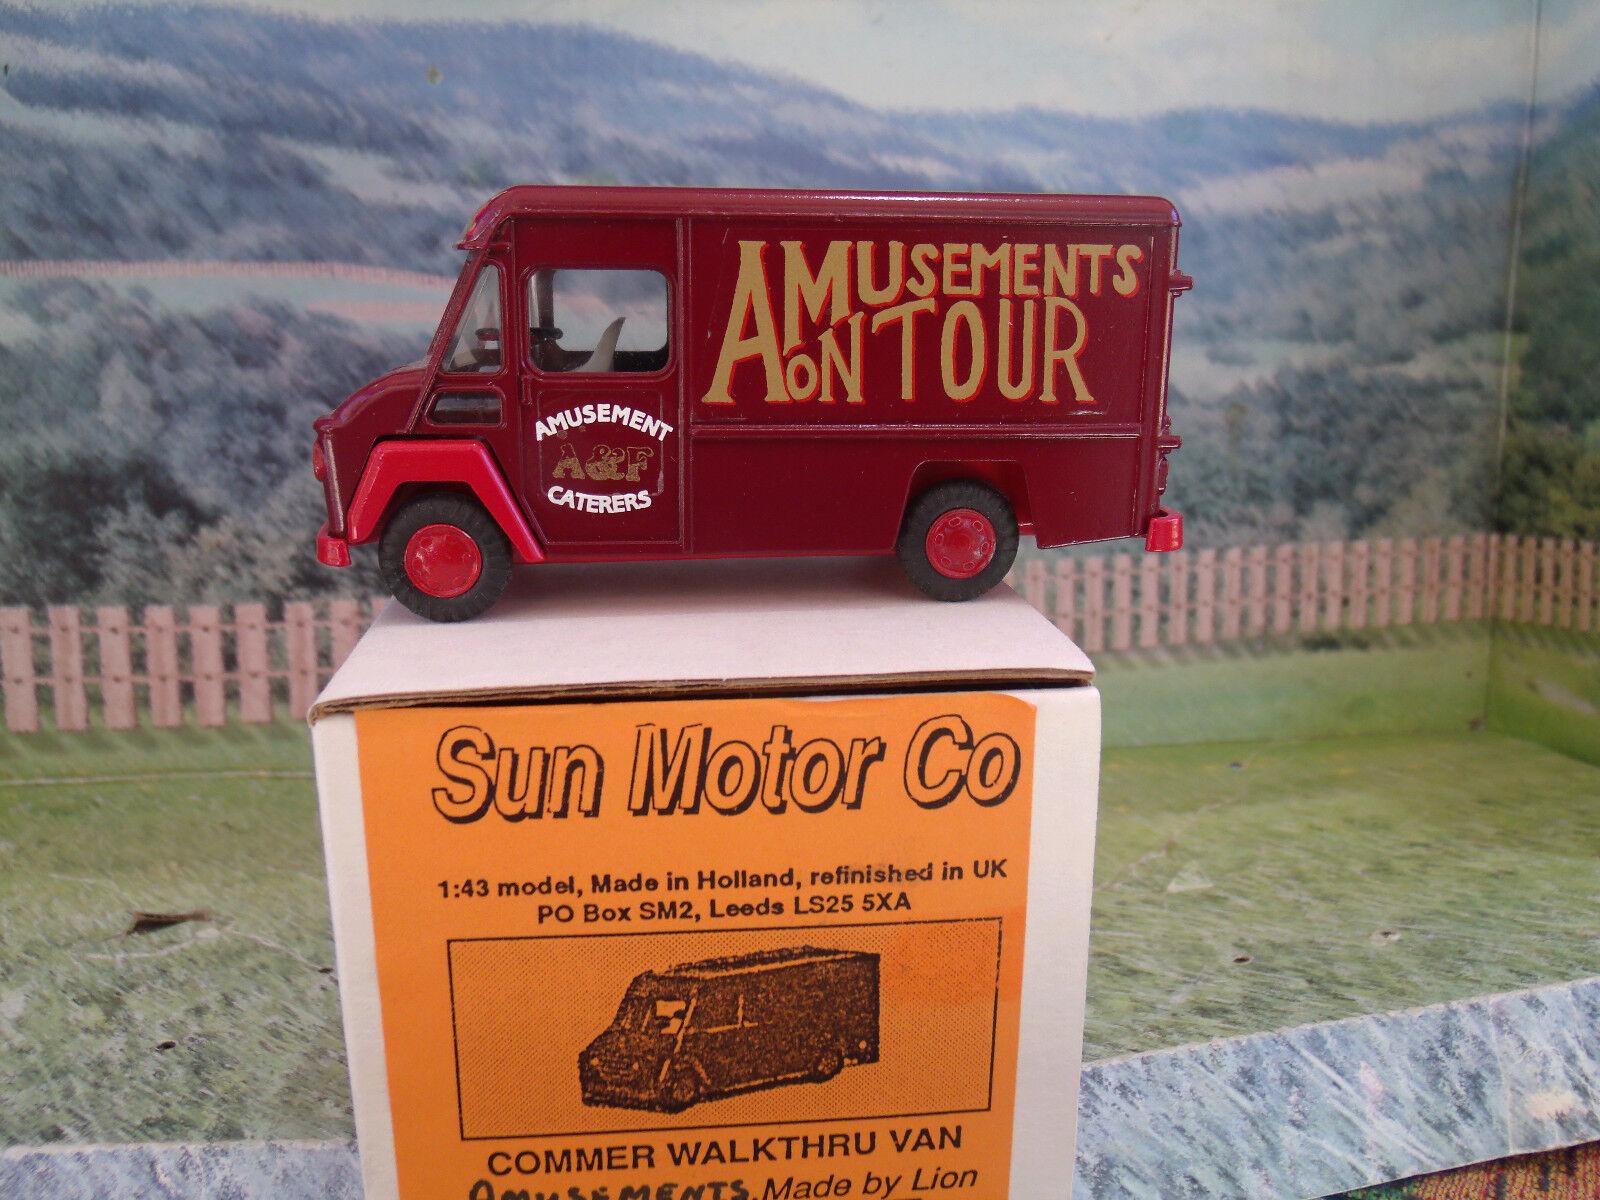 1 43 SUN MOTOR Co (England) Commer Van AmuseSiets on Tour, handbult  model